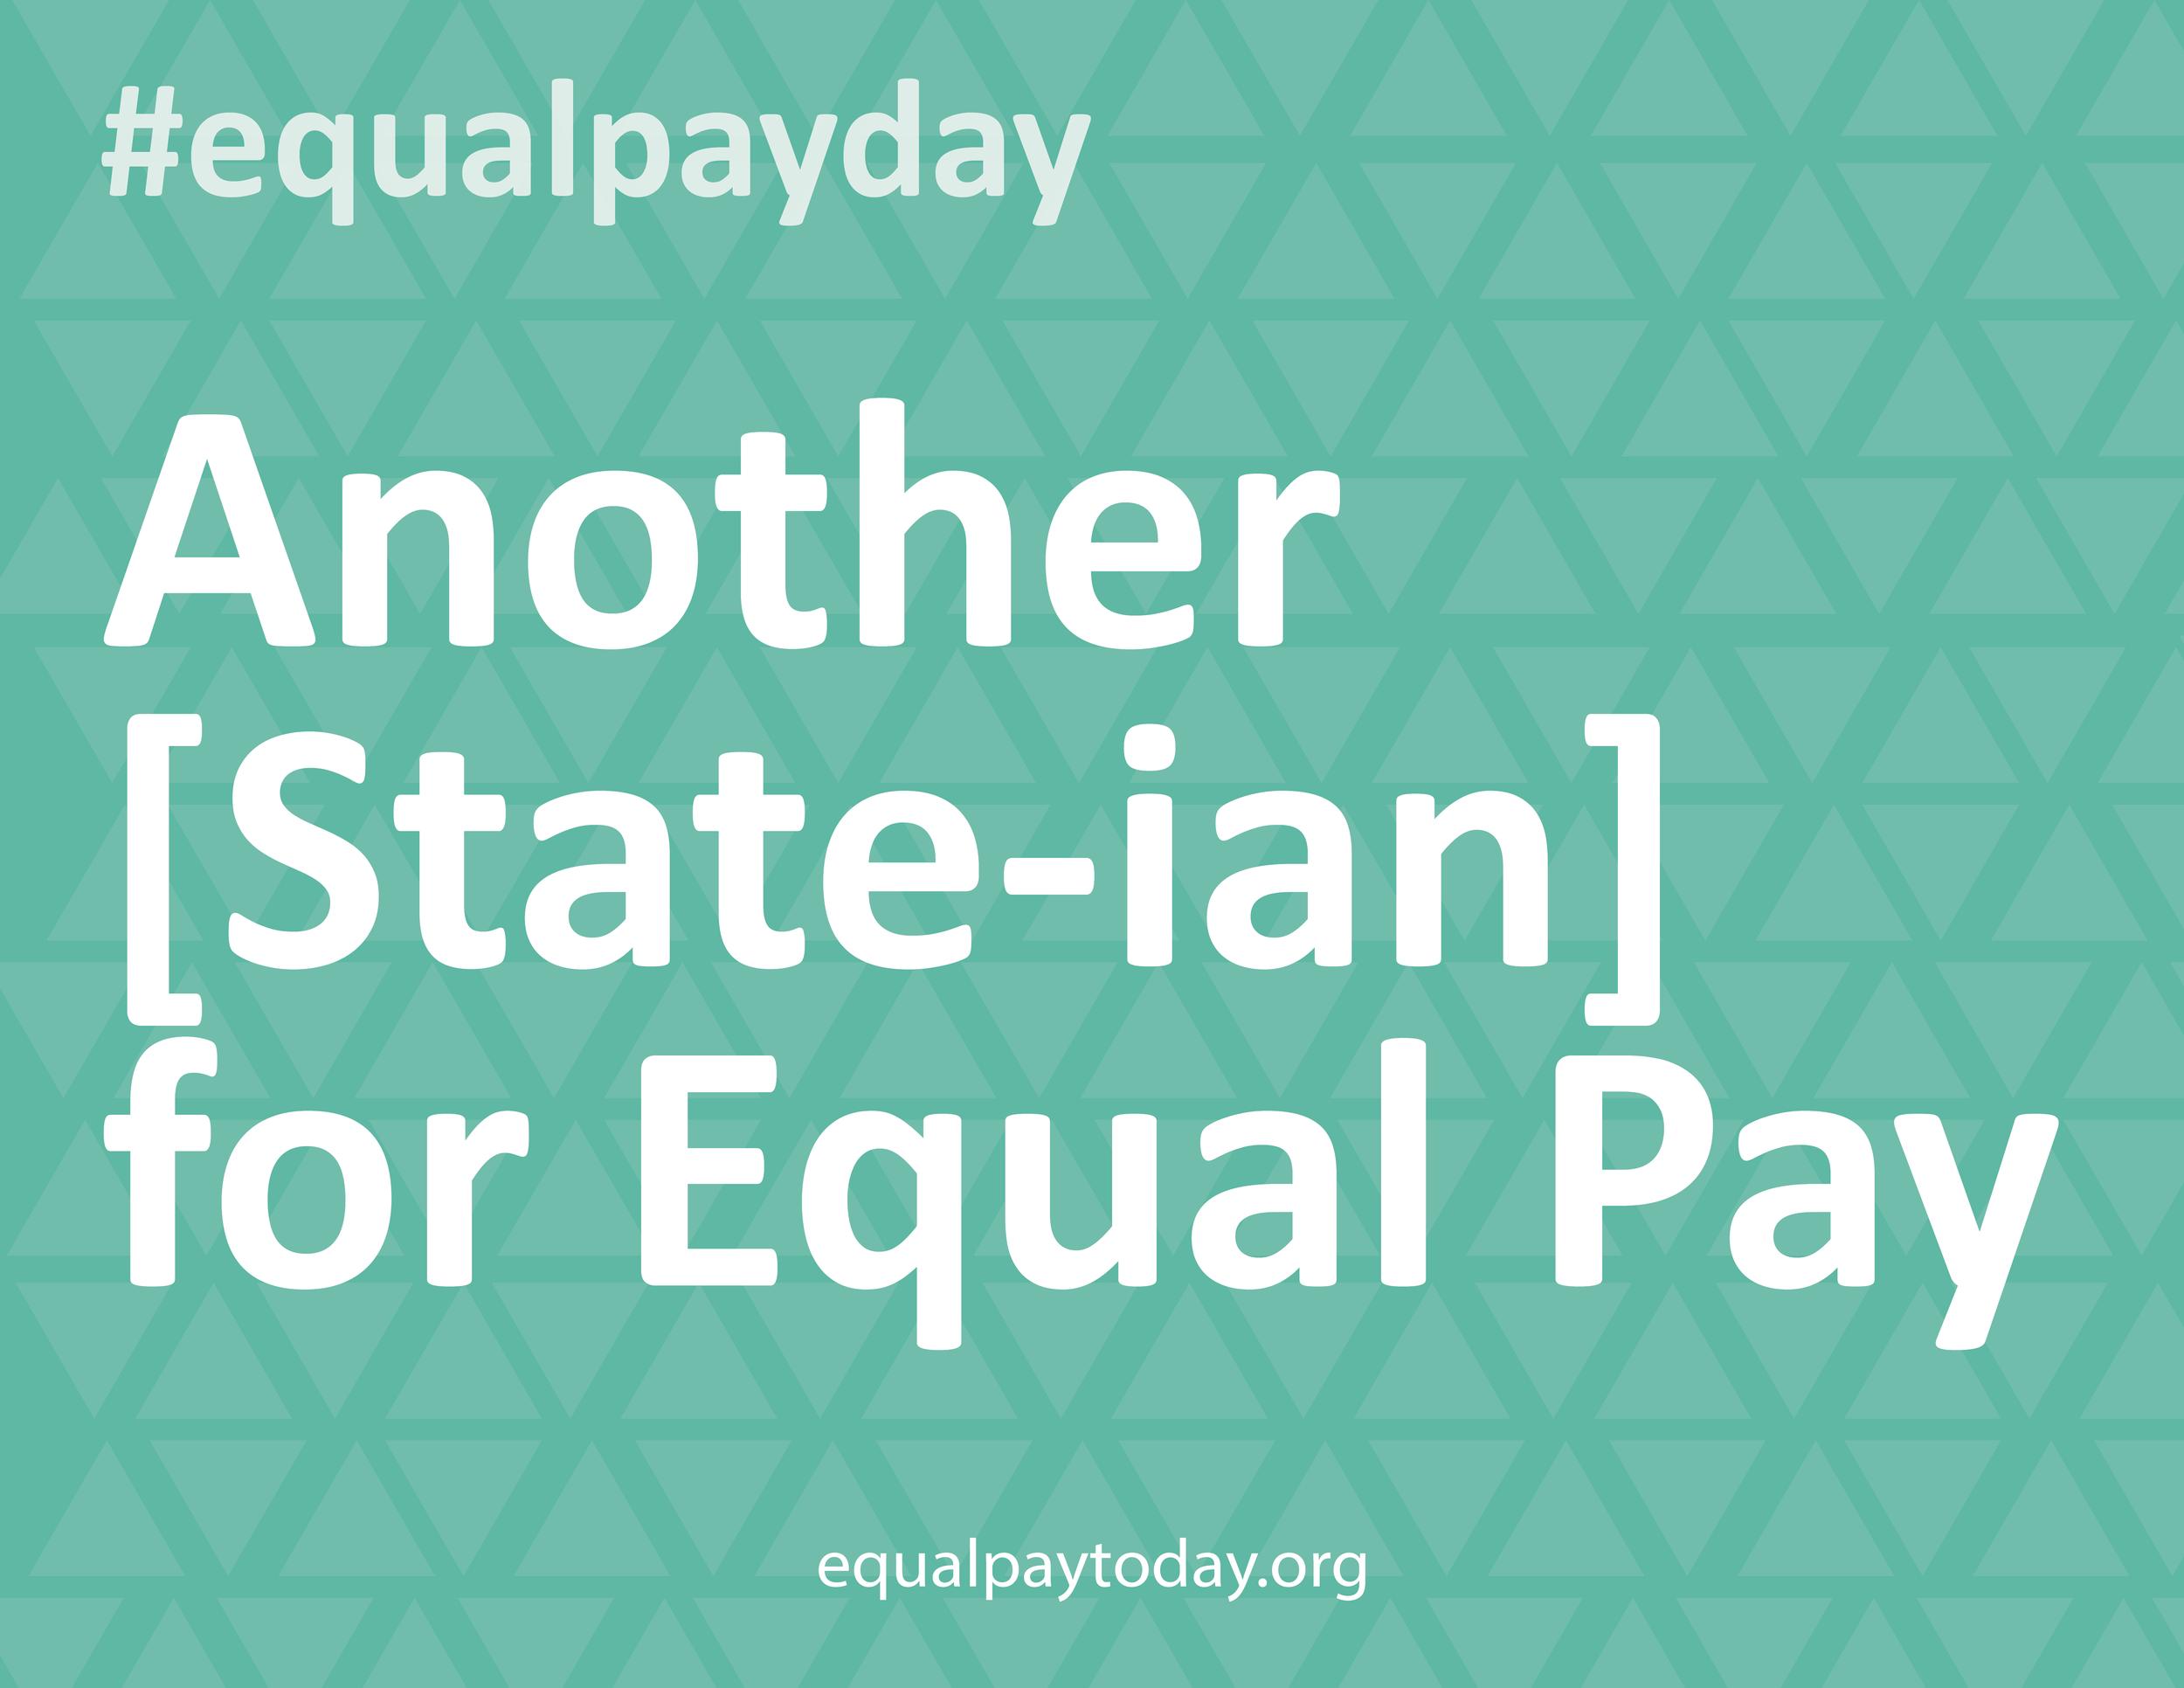 www.equalpaytoday.org/equalpaydays